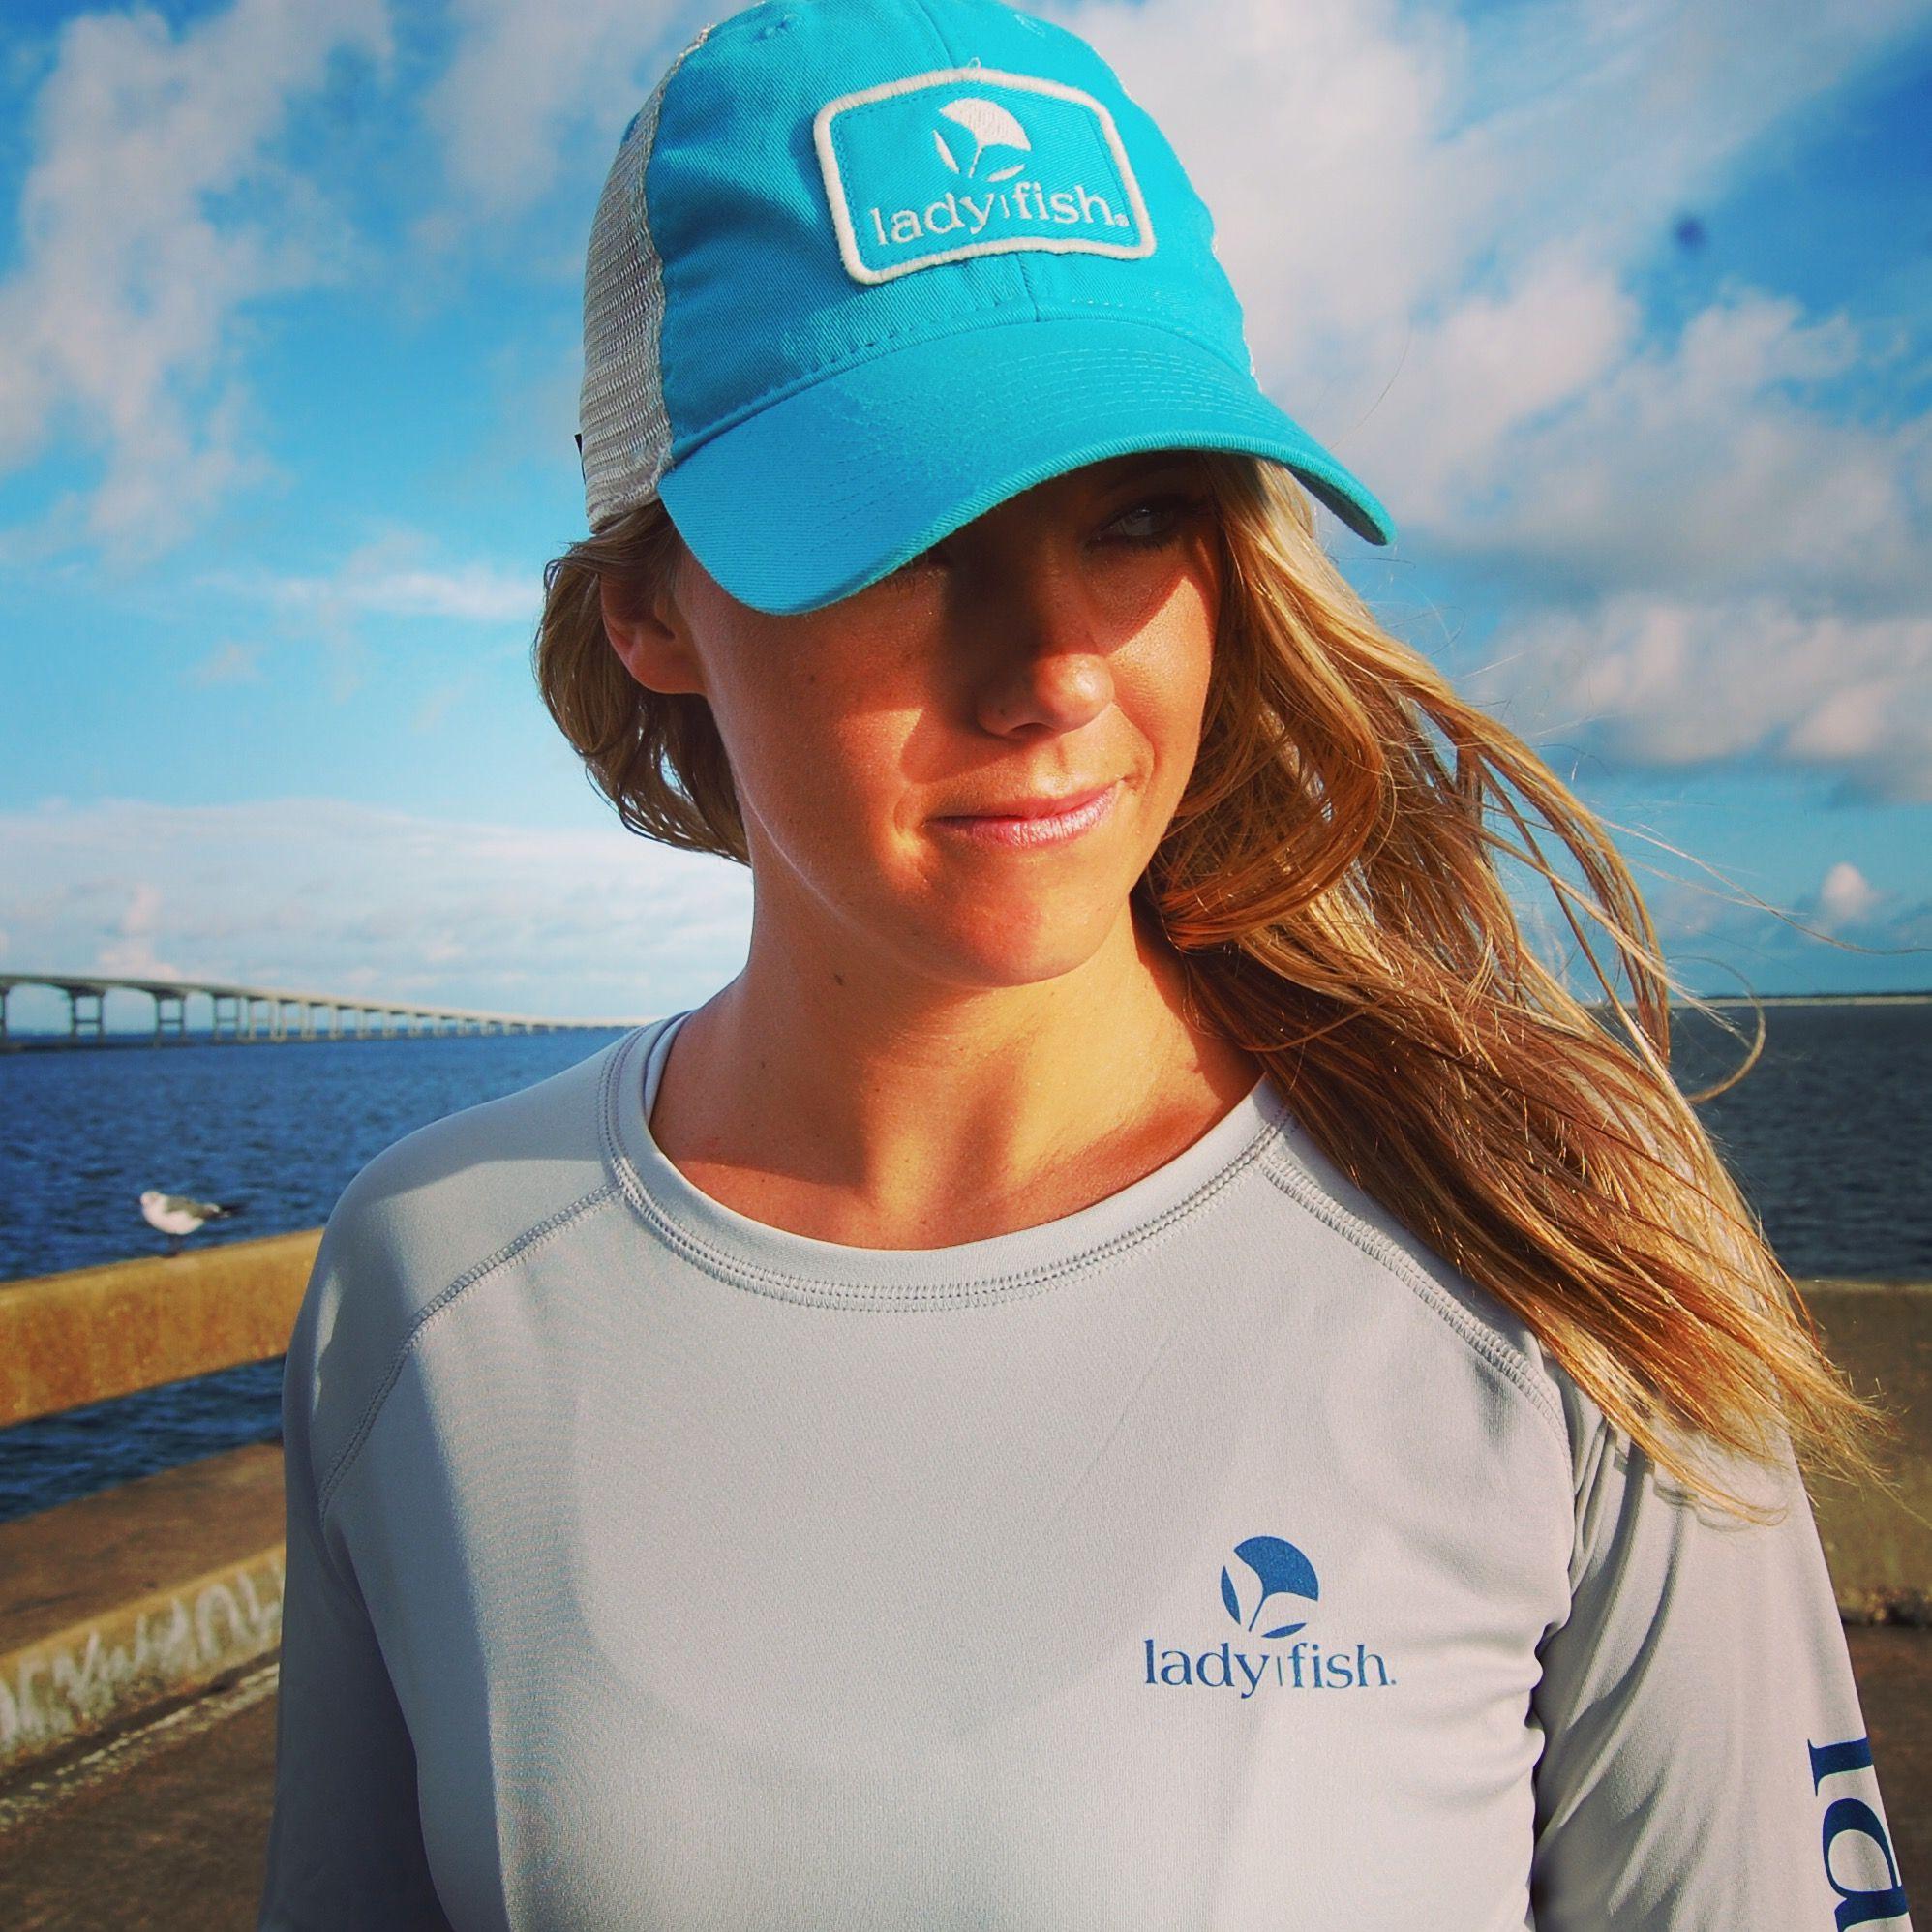 0911d42ab12 Women s fishing shirts! New ladyfish trucker hat! www.ladyfish.com ...